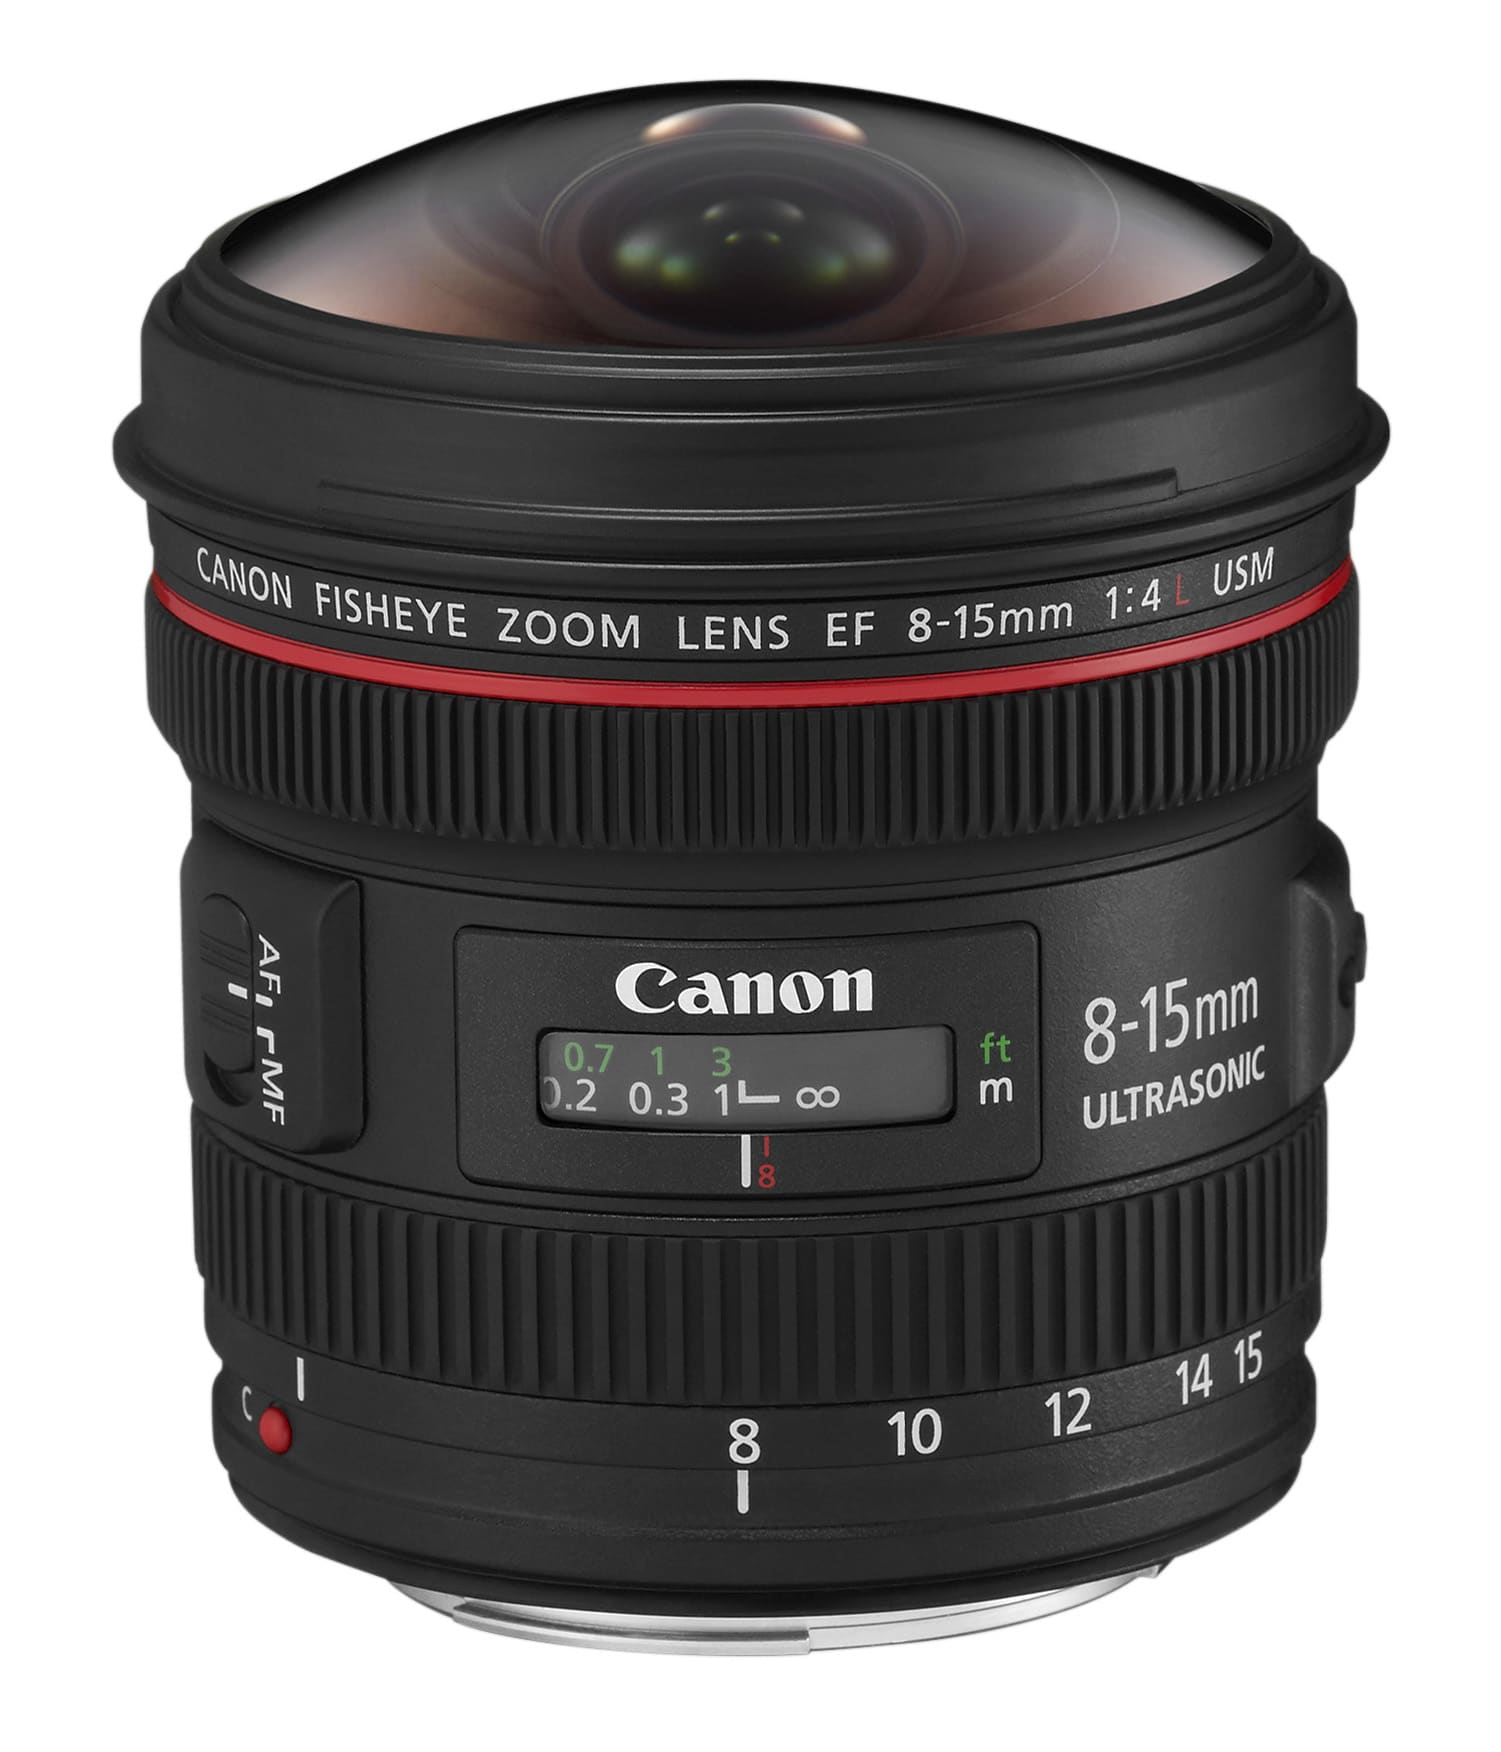 Canon 8-15 f4 L Fisheye Image Samples